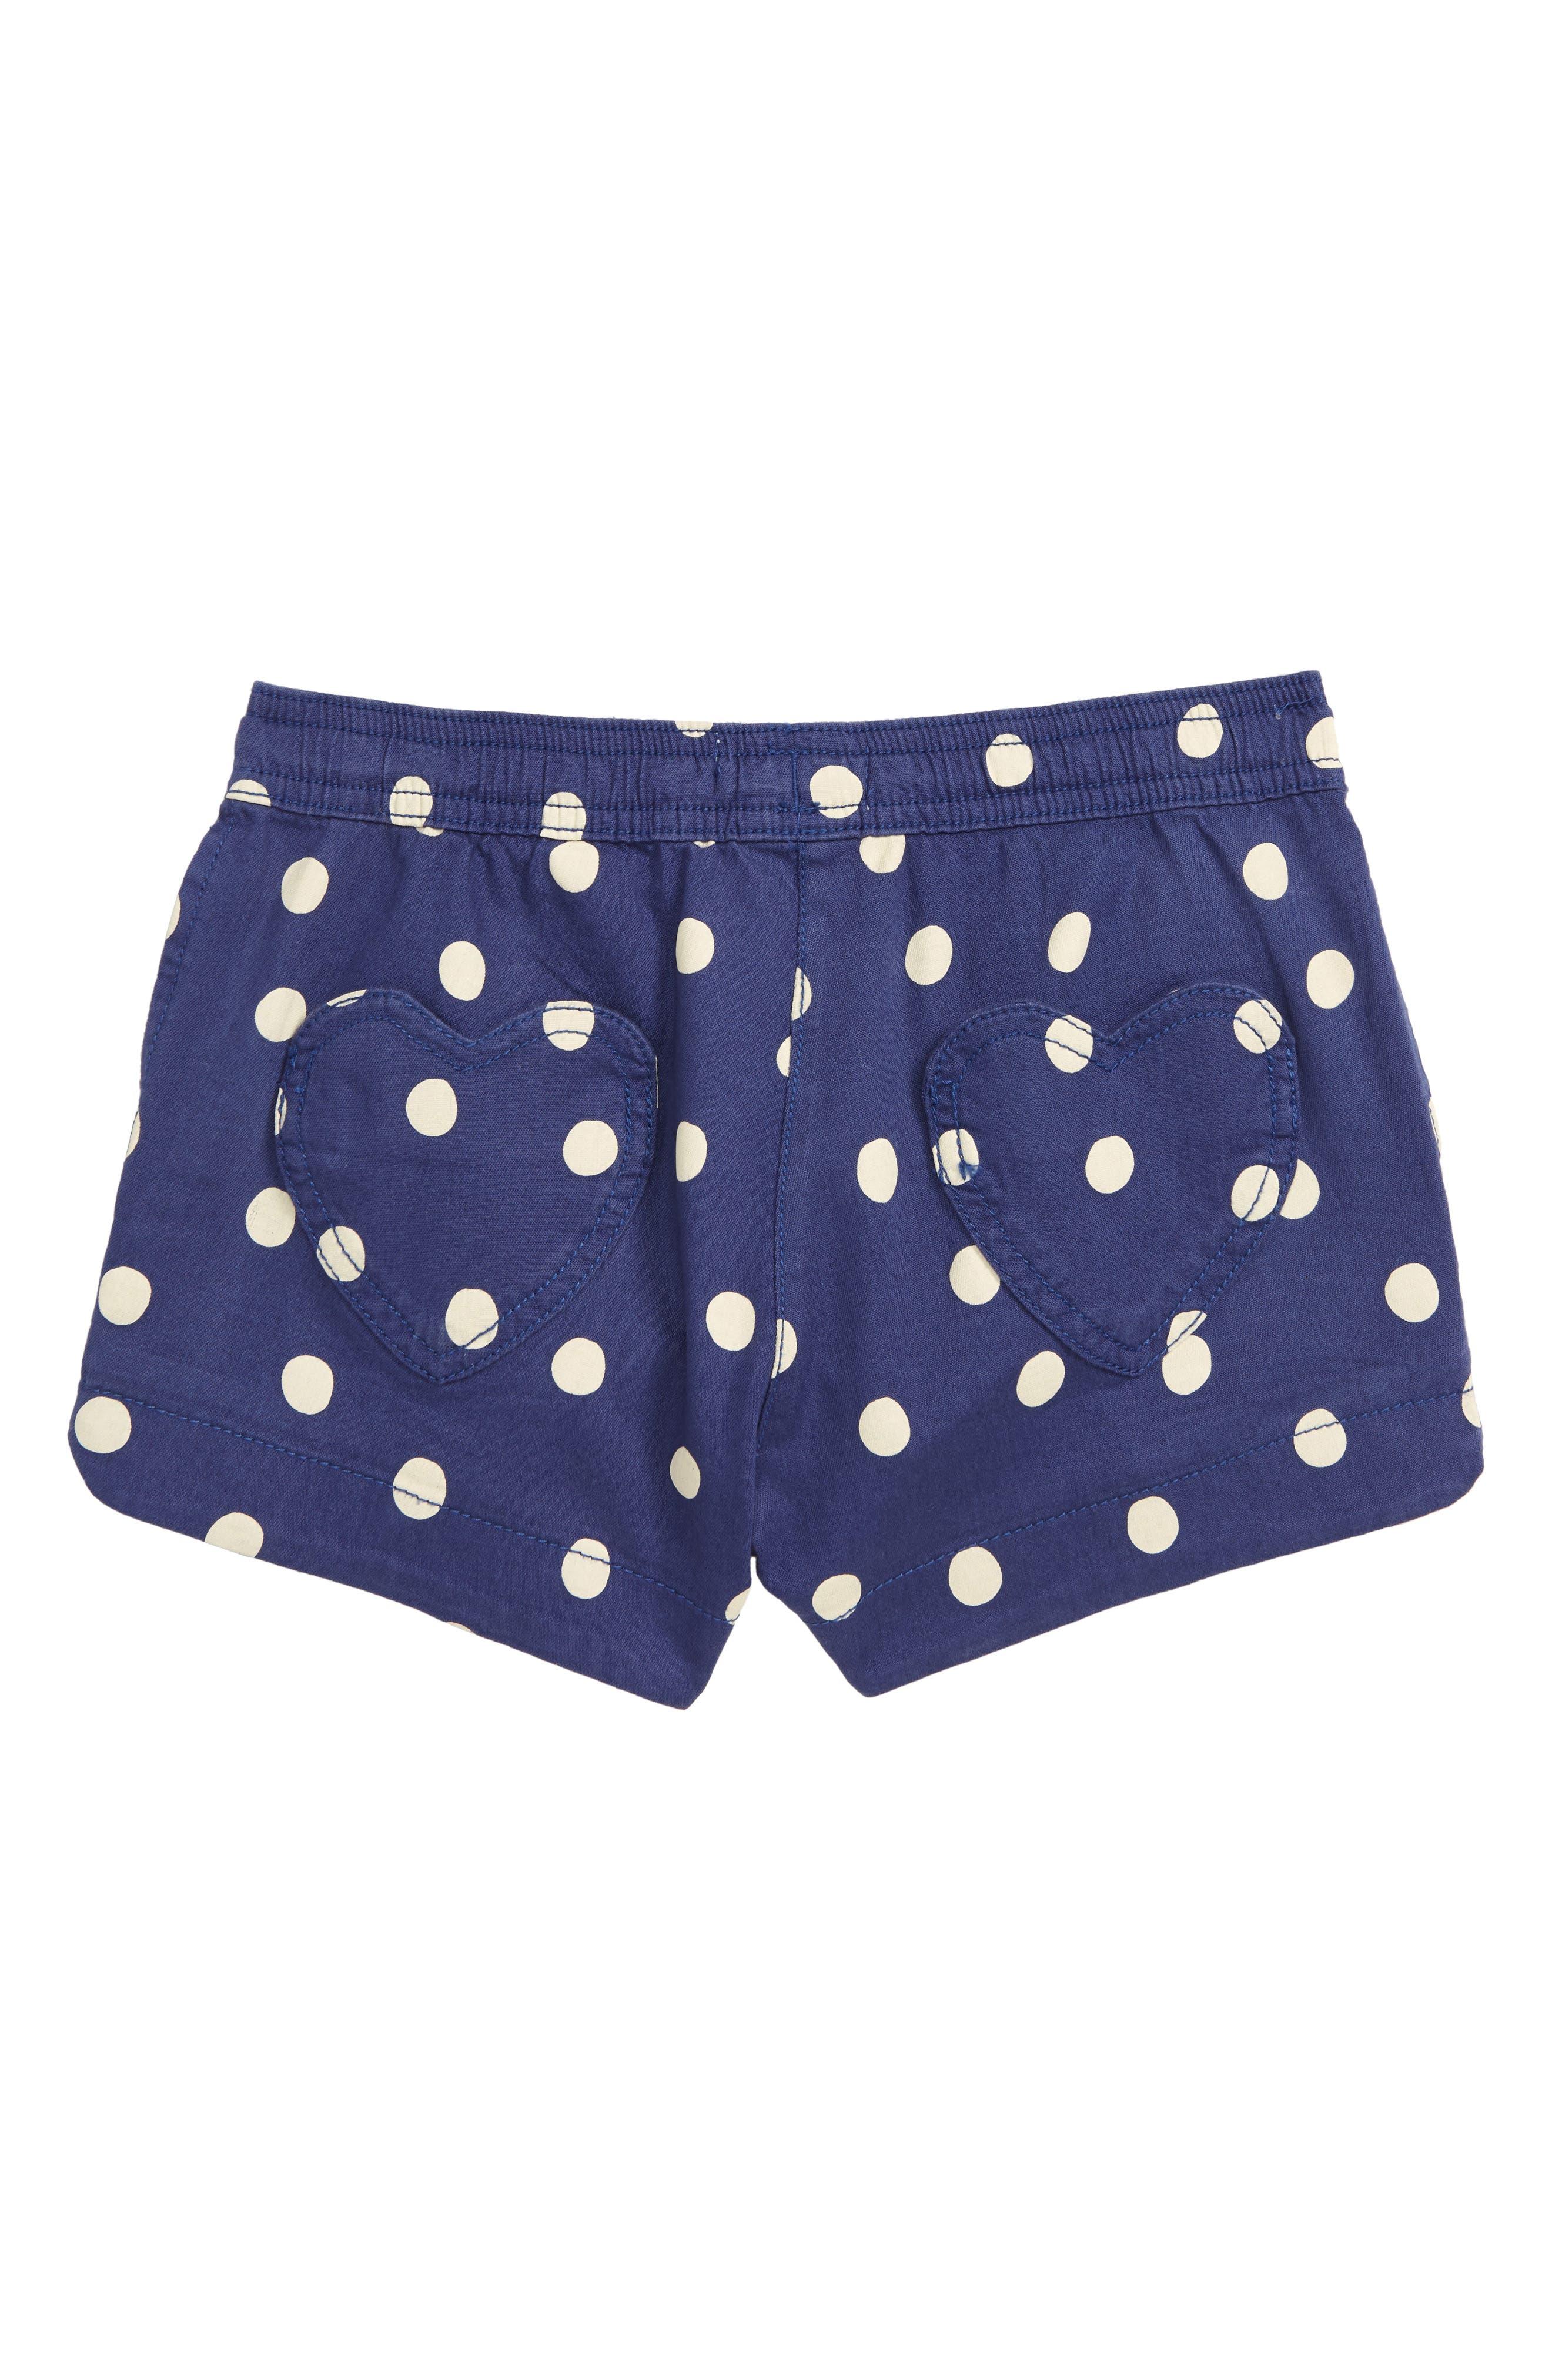 BODEN,                             Heart Pocket Shorts,                             Alternate thumbnail 2, color,                             BLU STARBOARD BLUE/ ECRU SPOT